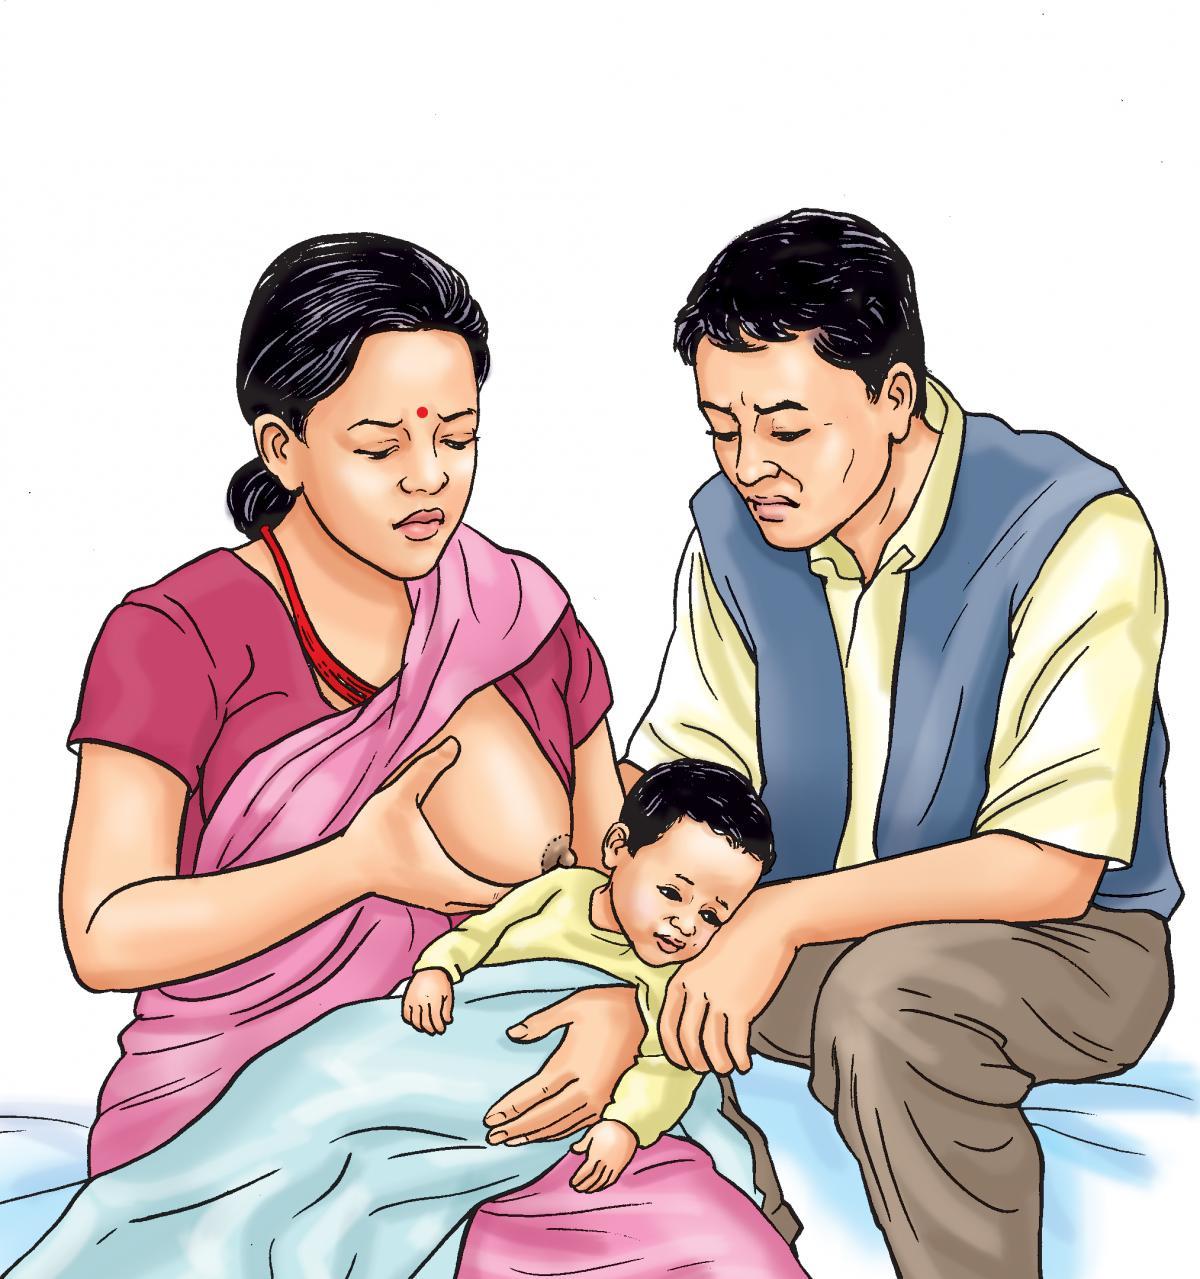 Sick child health - Refusal to feed - 01 - Nepal